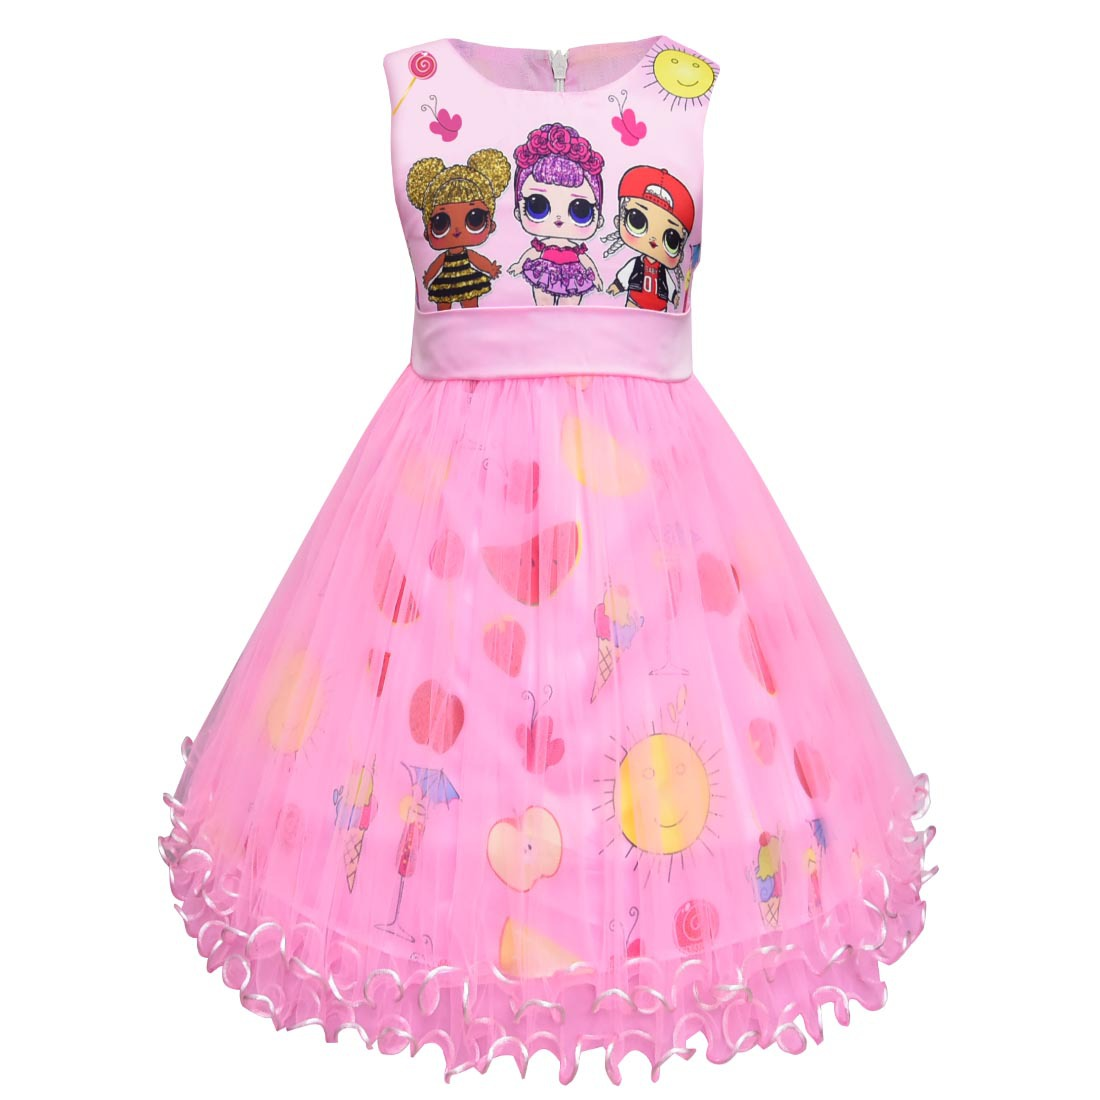 Girl Princess Birthday Party Ruffle Mesh Kids Dresses For